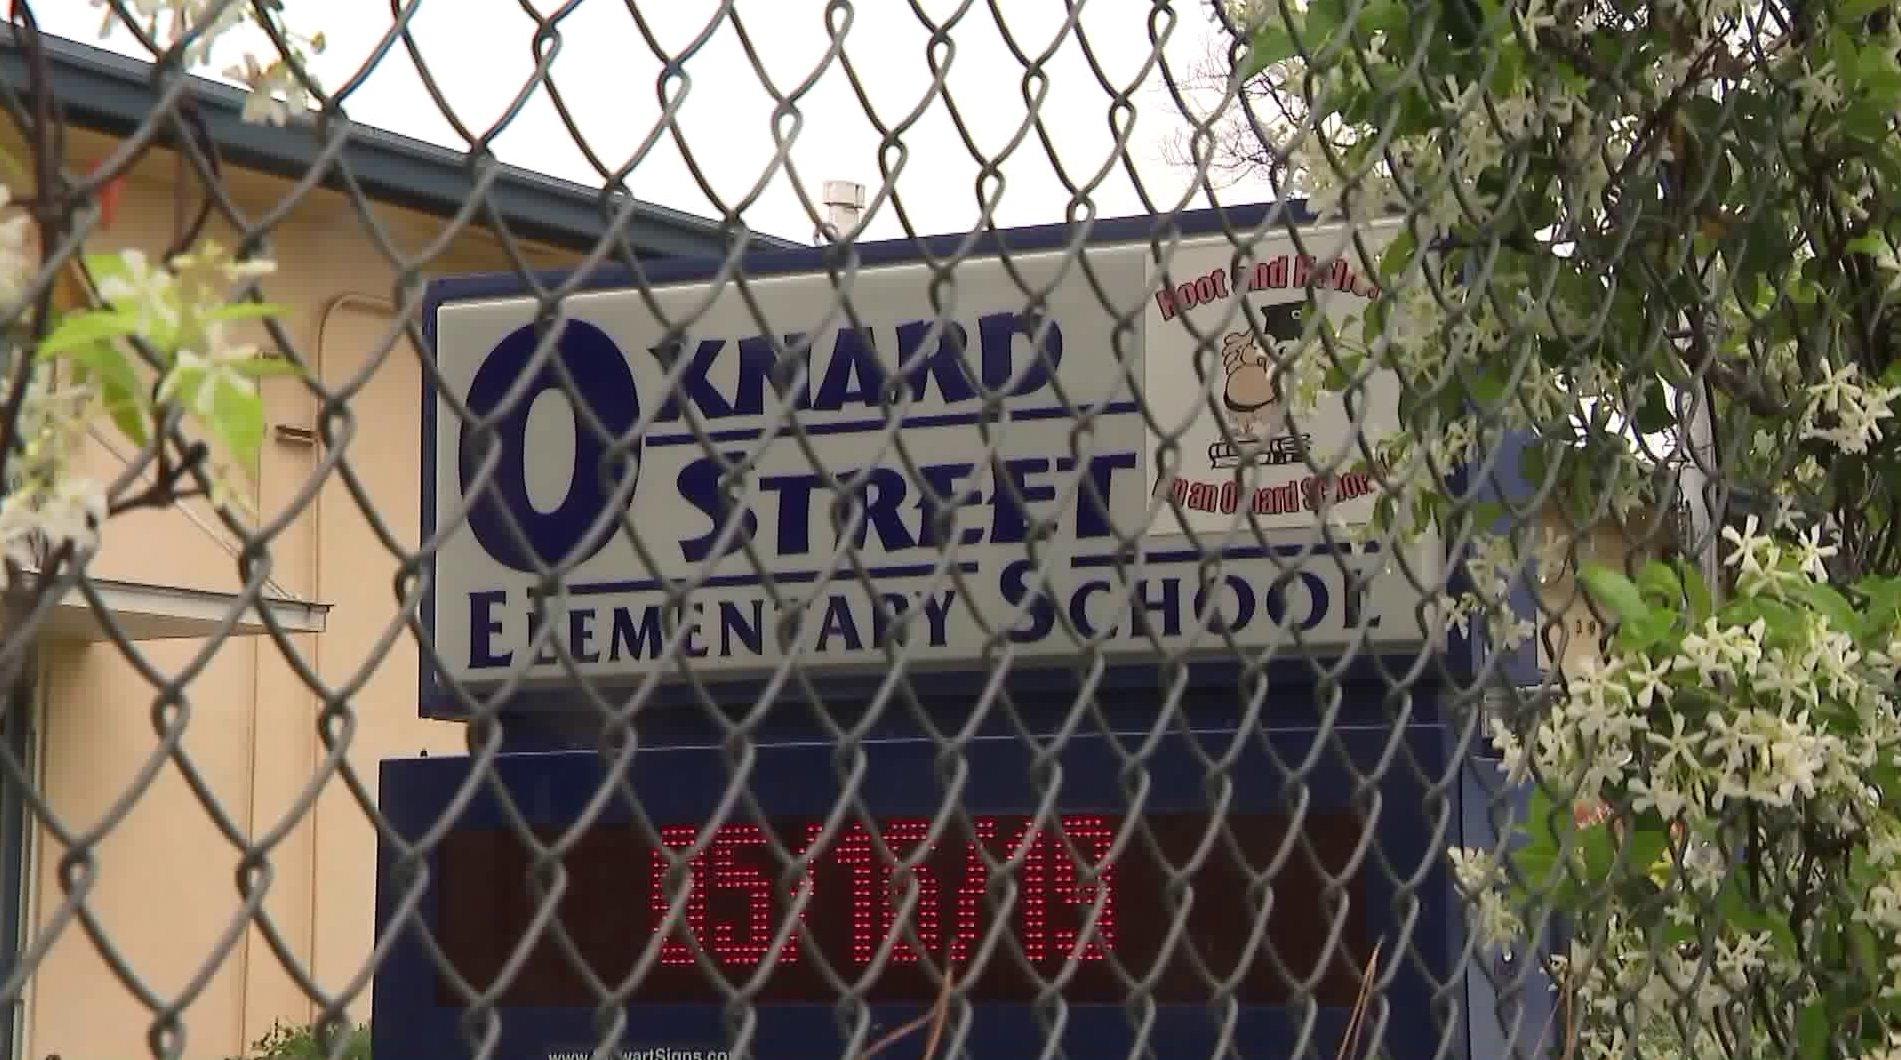 Oxnard Street School in North Hollywood